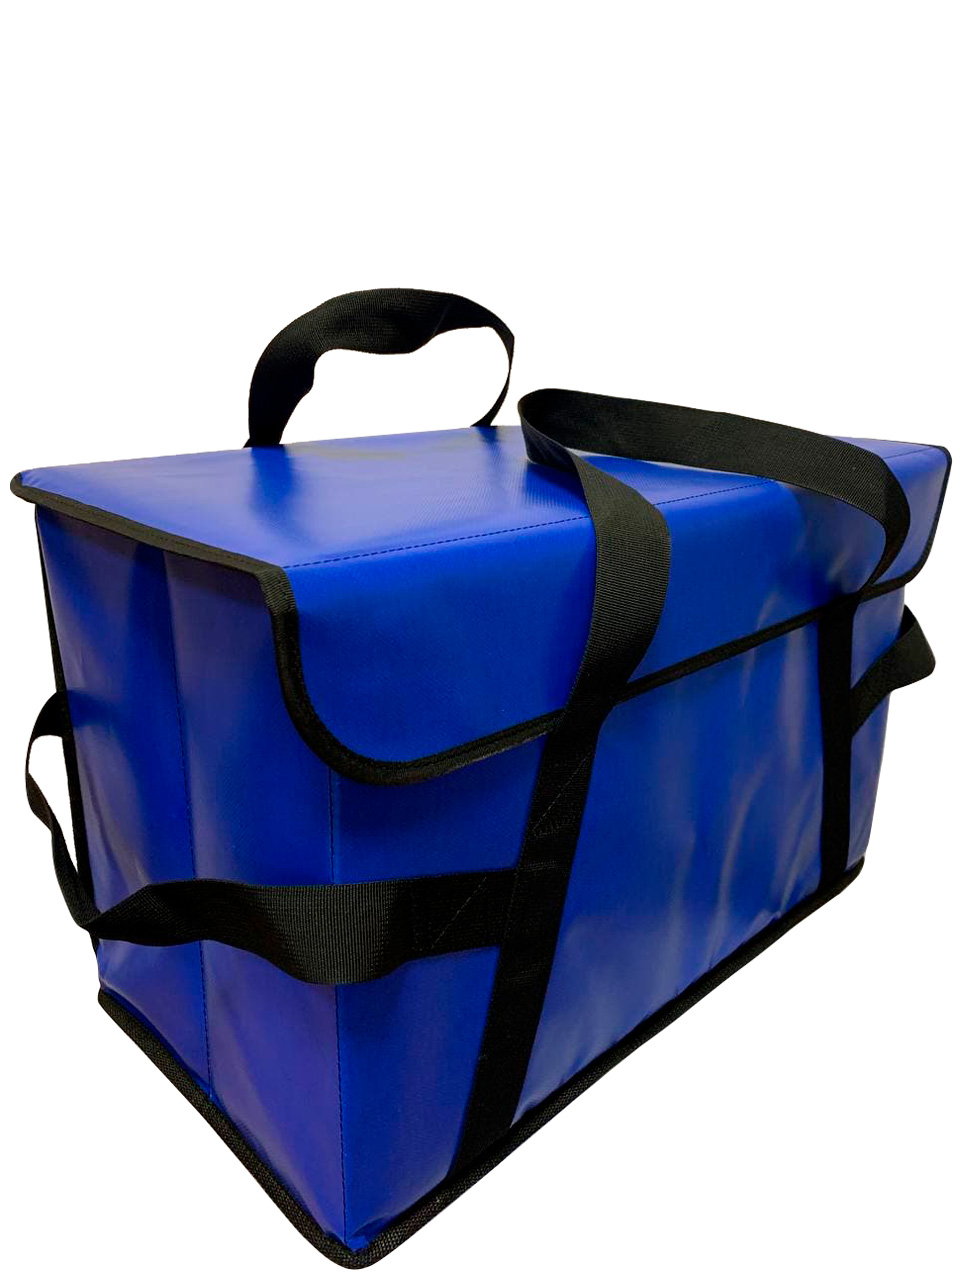 blue-bag-1